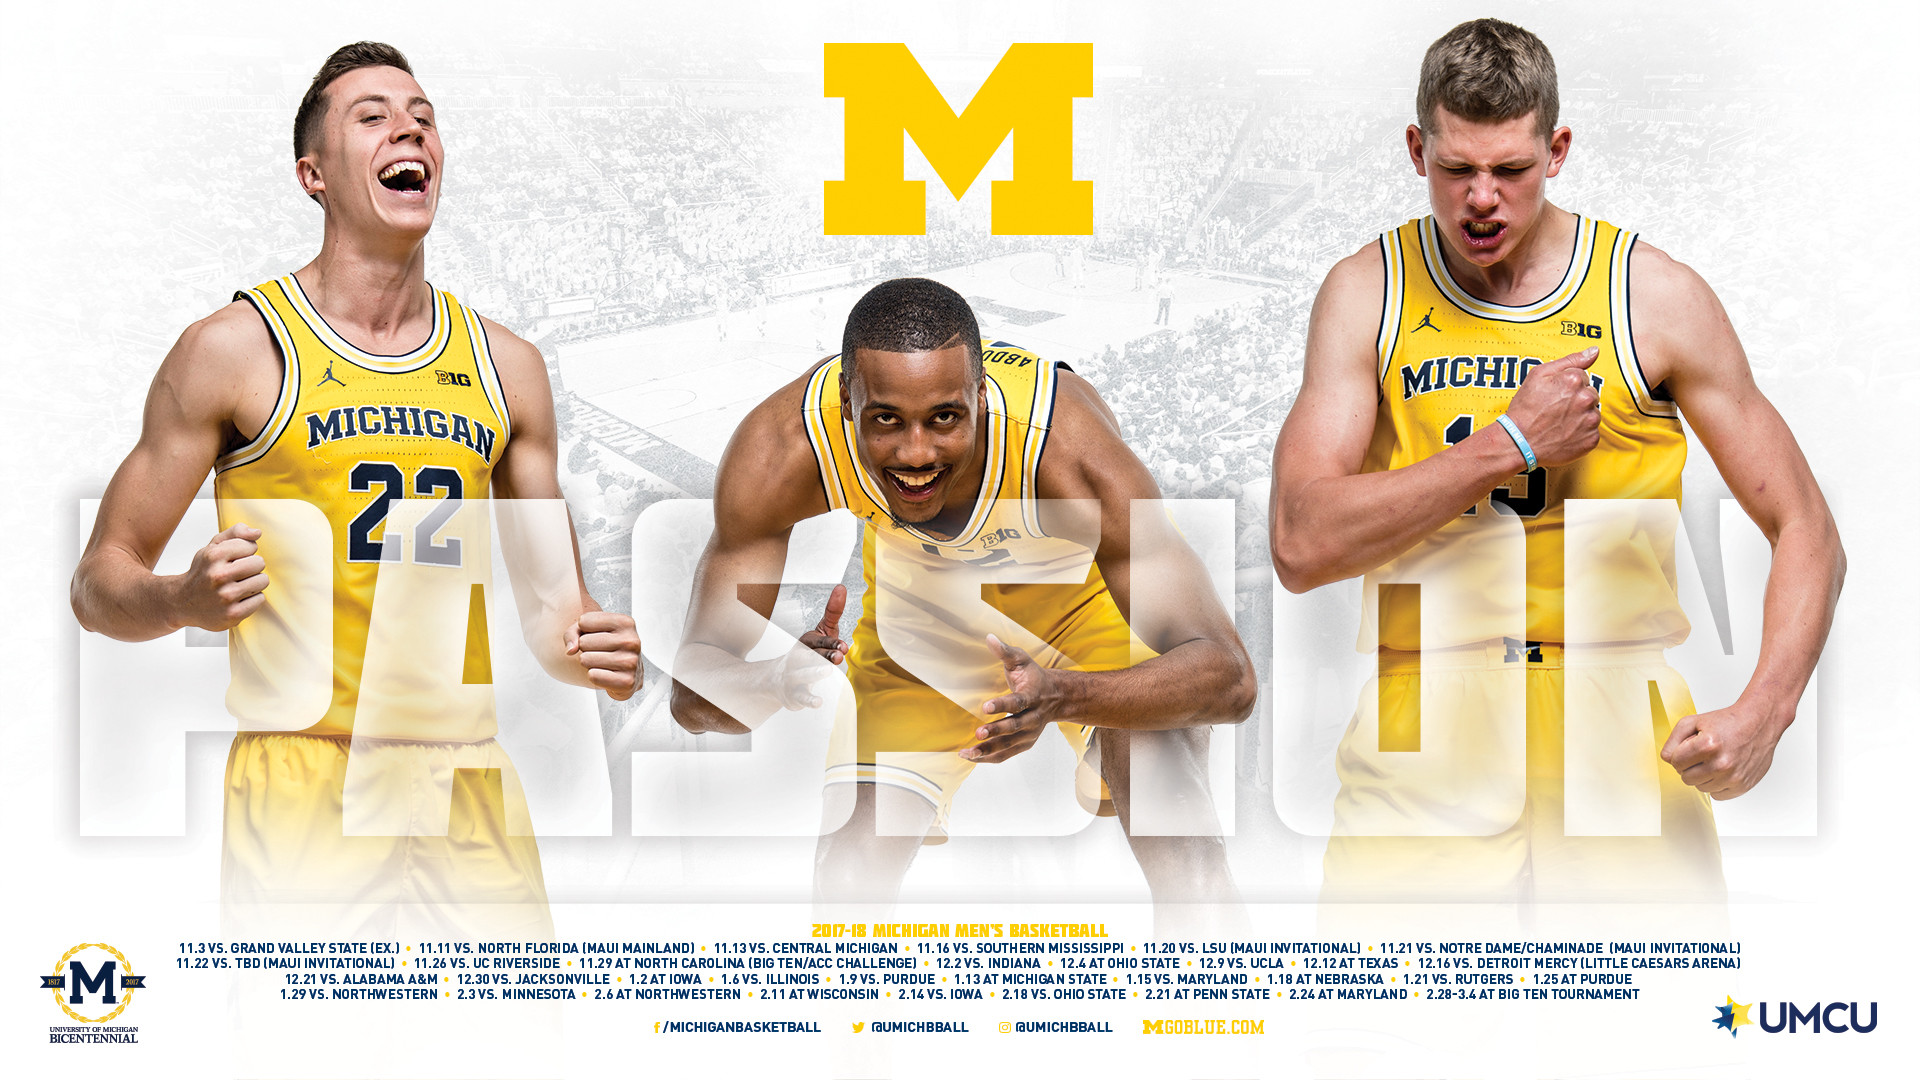 University Of Michigan Hd Wallpaper 76 Images